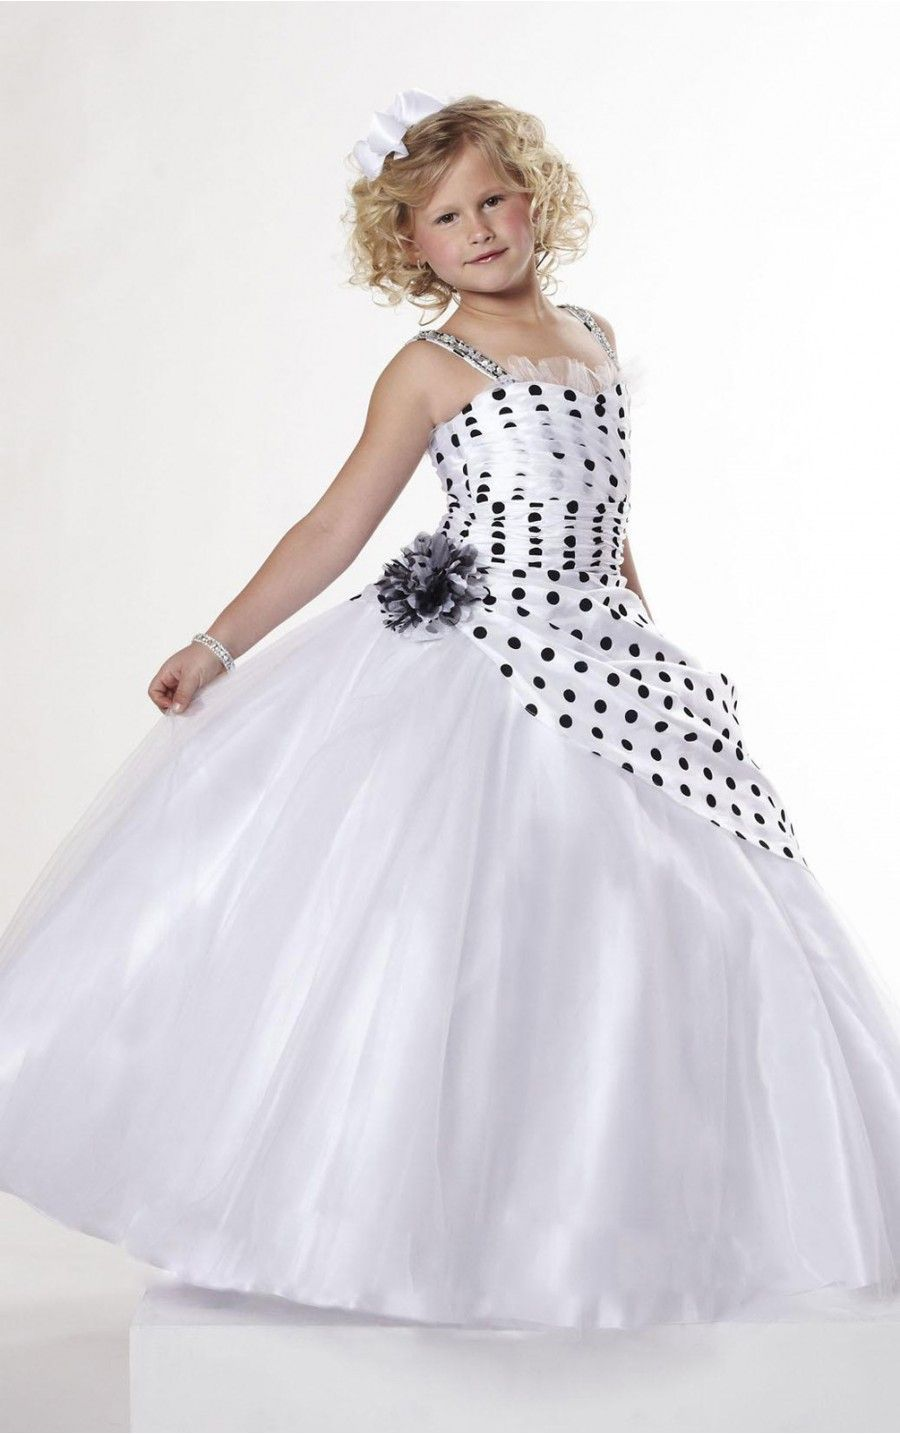 Multi Colors Ball Gown Floor-length Spaghetti Straps Dress [Dresses 9517] - $179.00 : - KissPromGirl.com